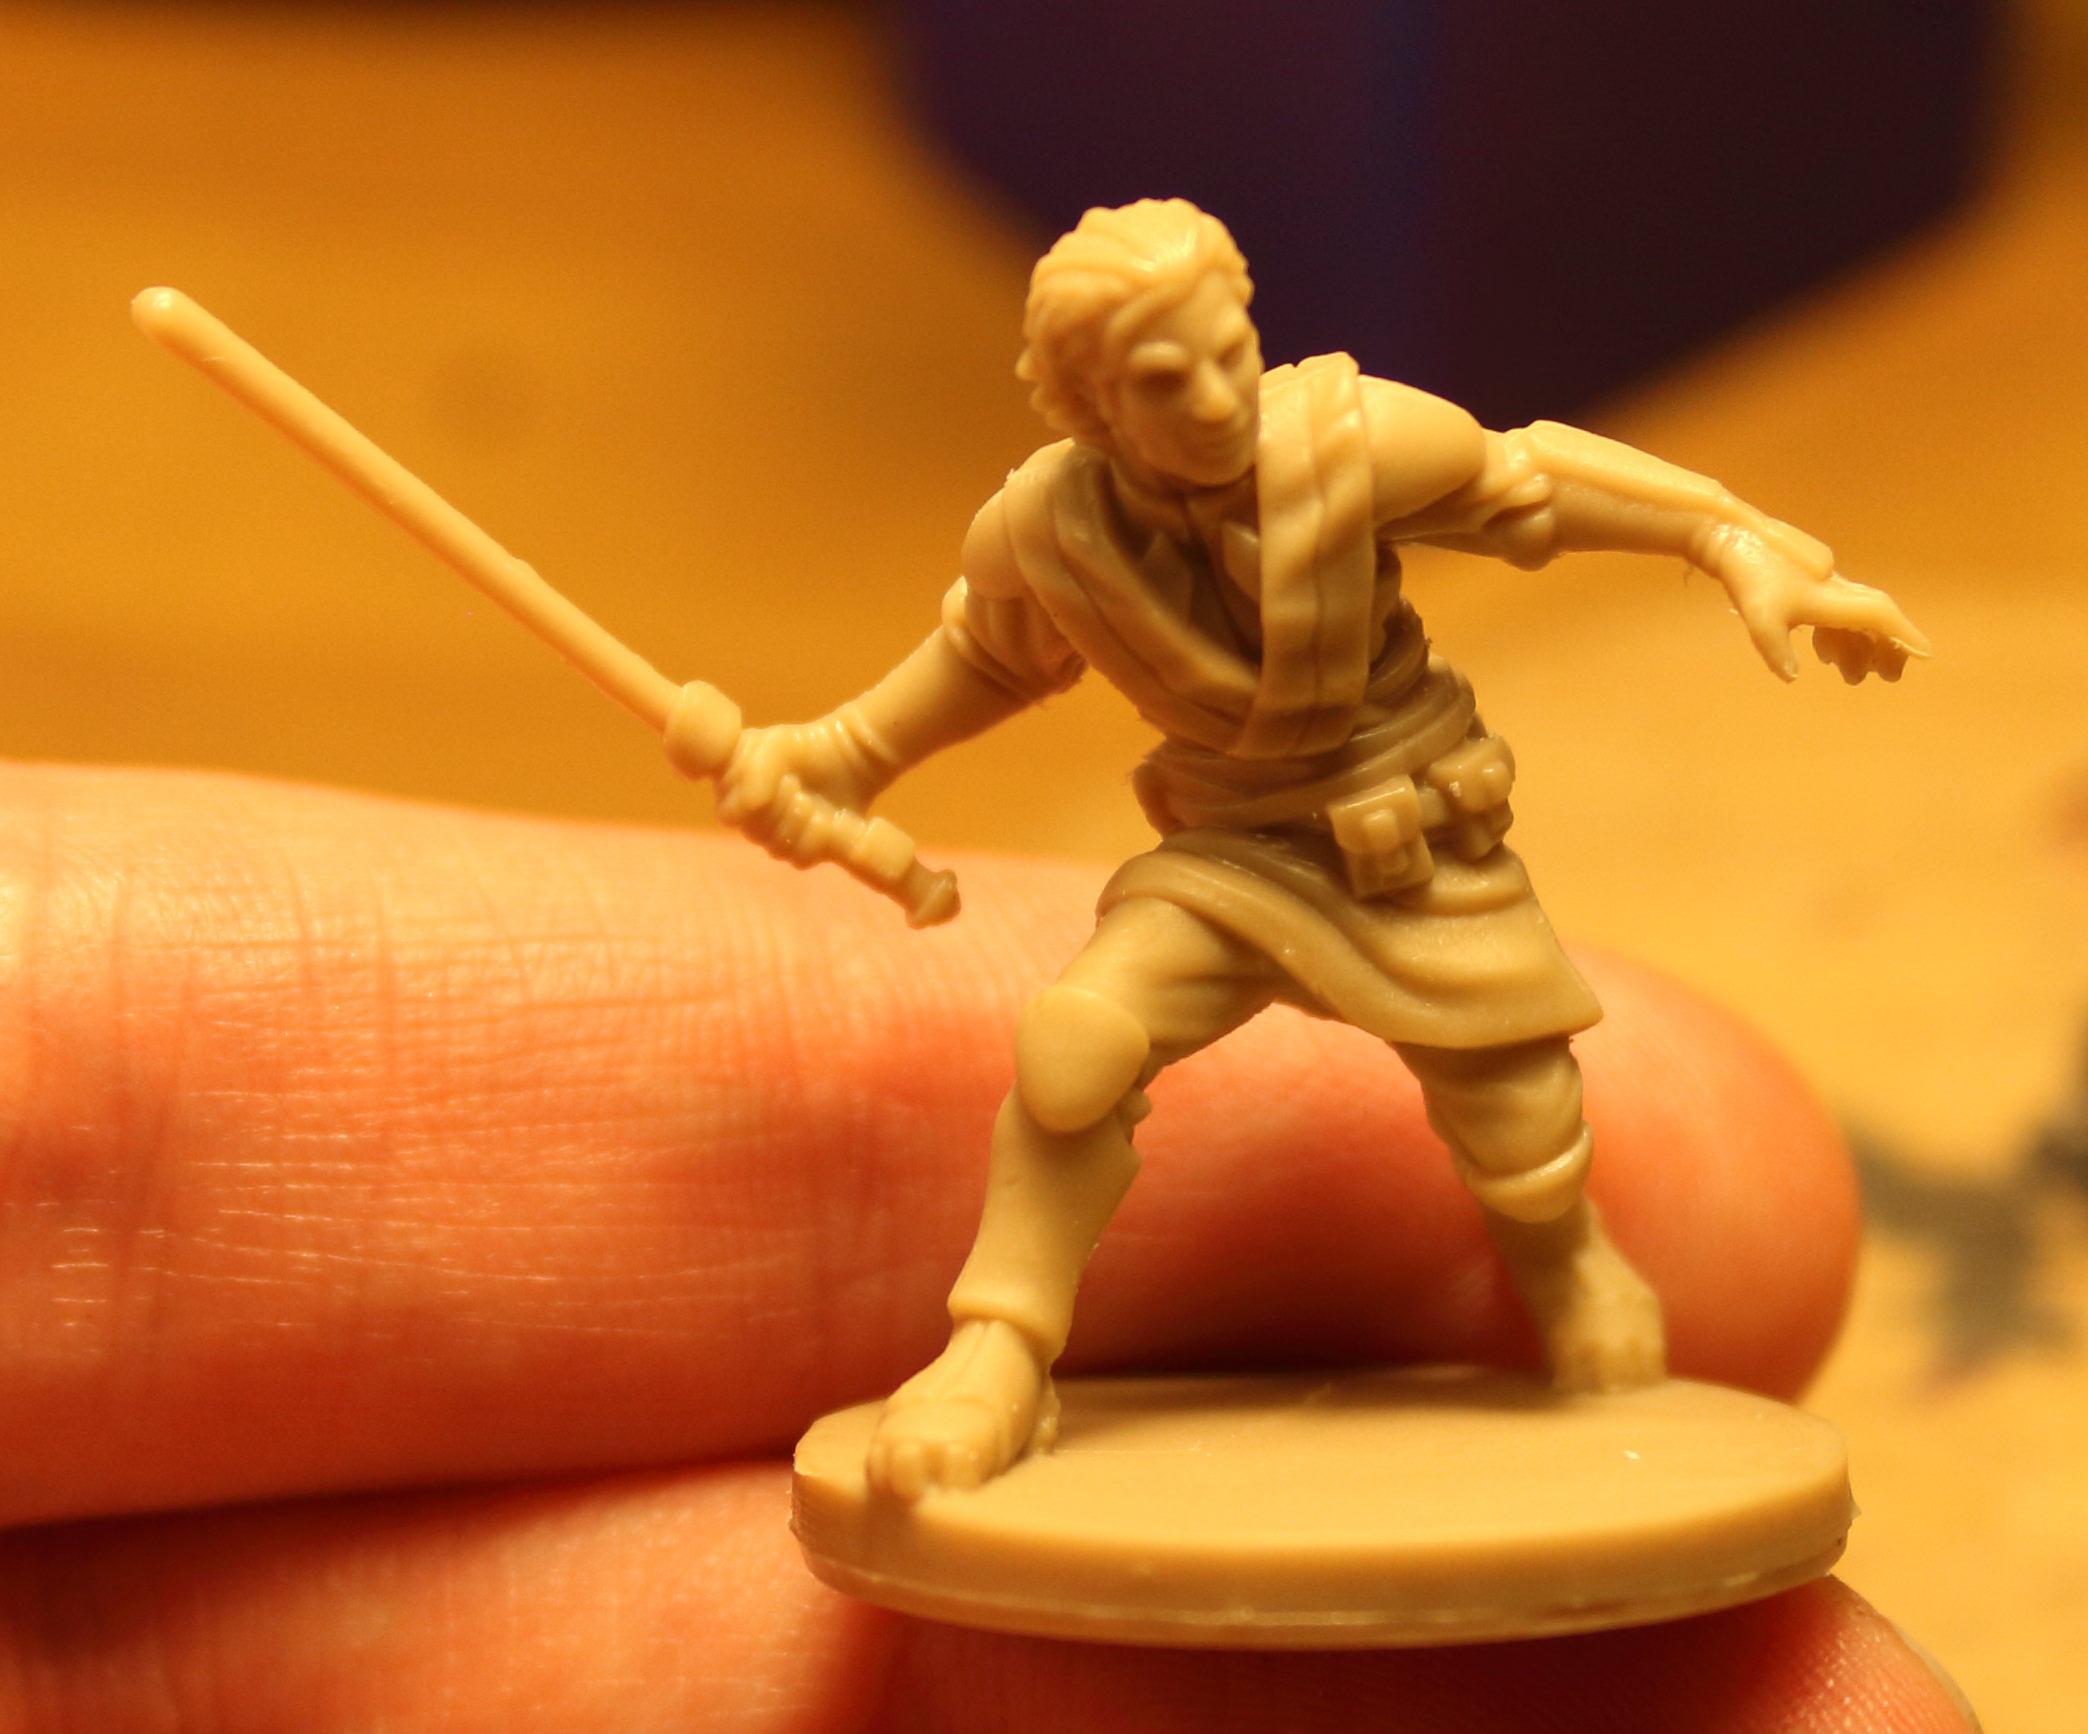 Imperial_Assault_Board_Game_LED_lightsaber_miniature_01.jpg